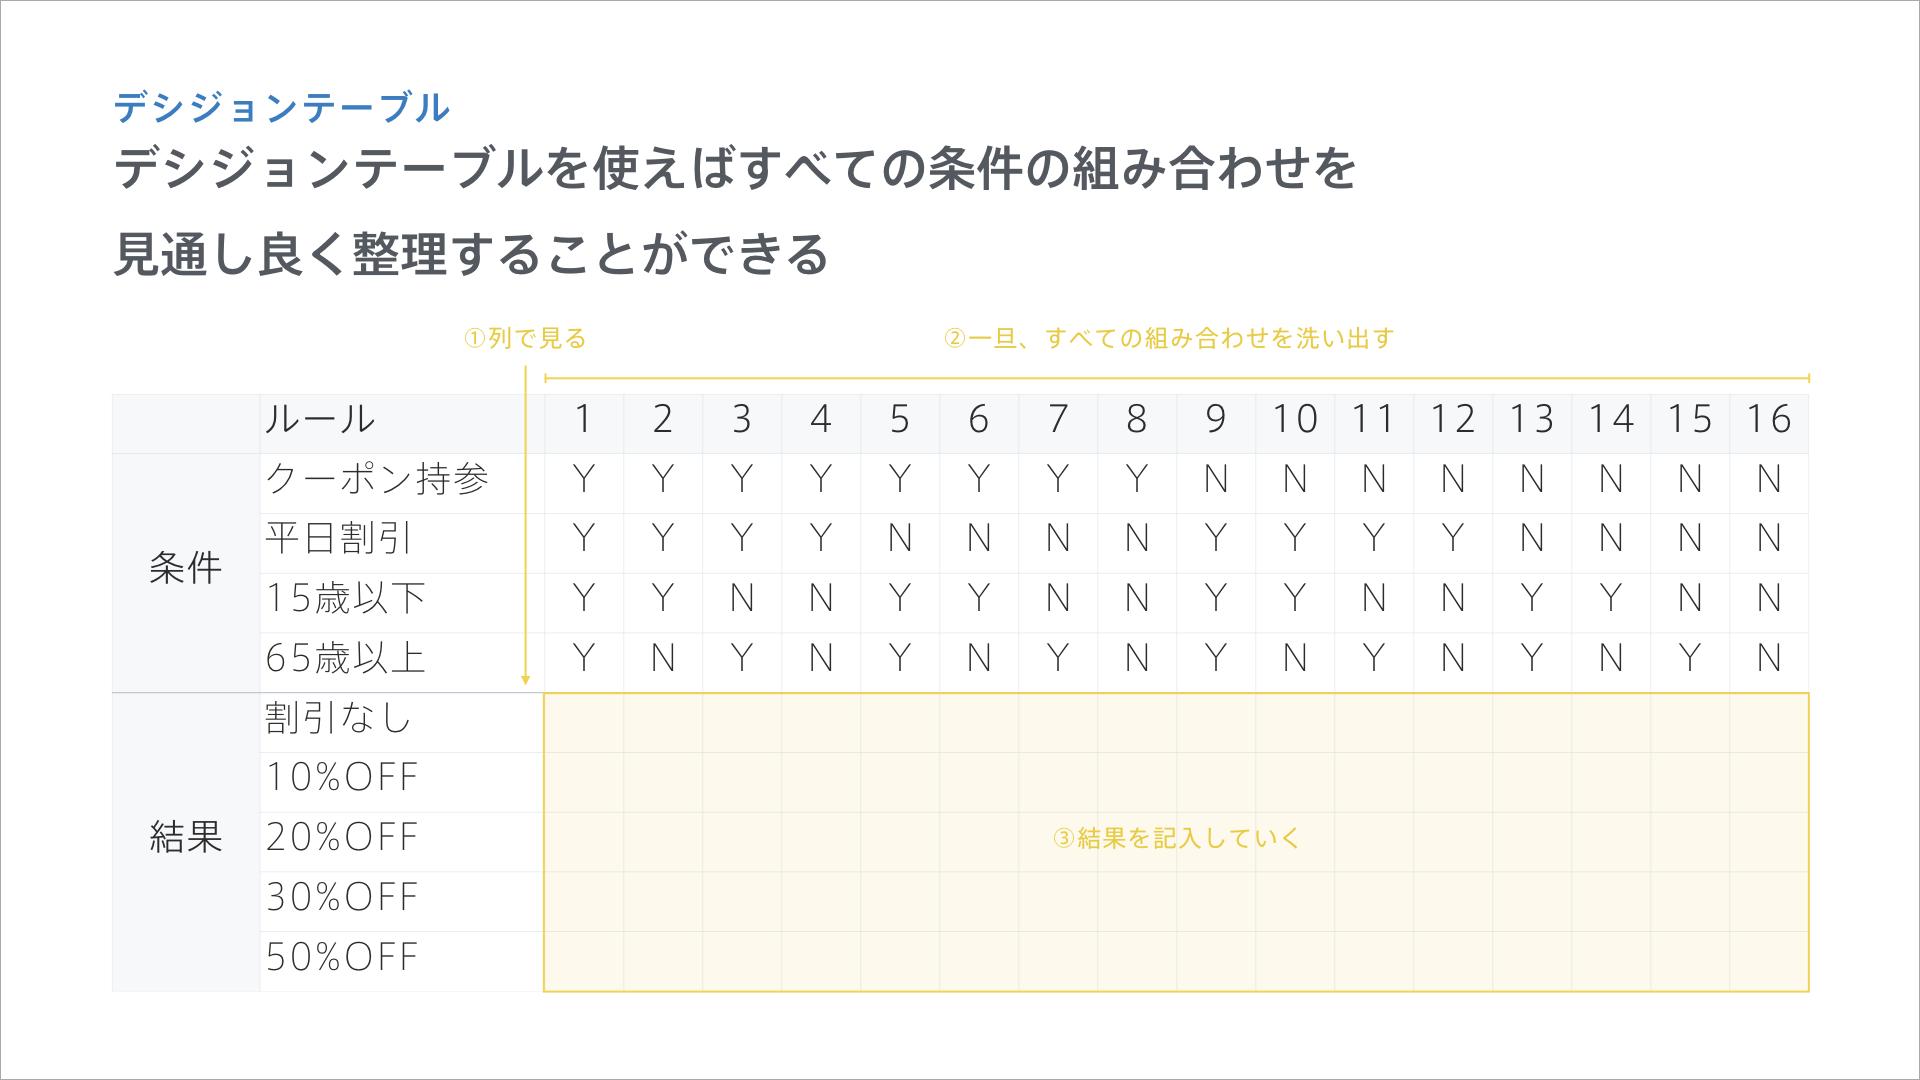 QA_WorkFlow.001.jpeg